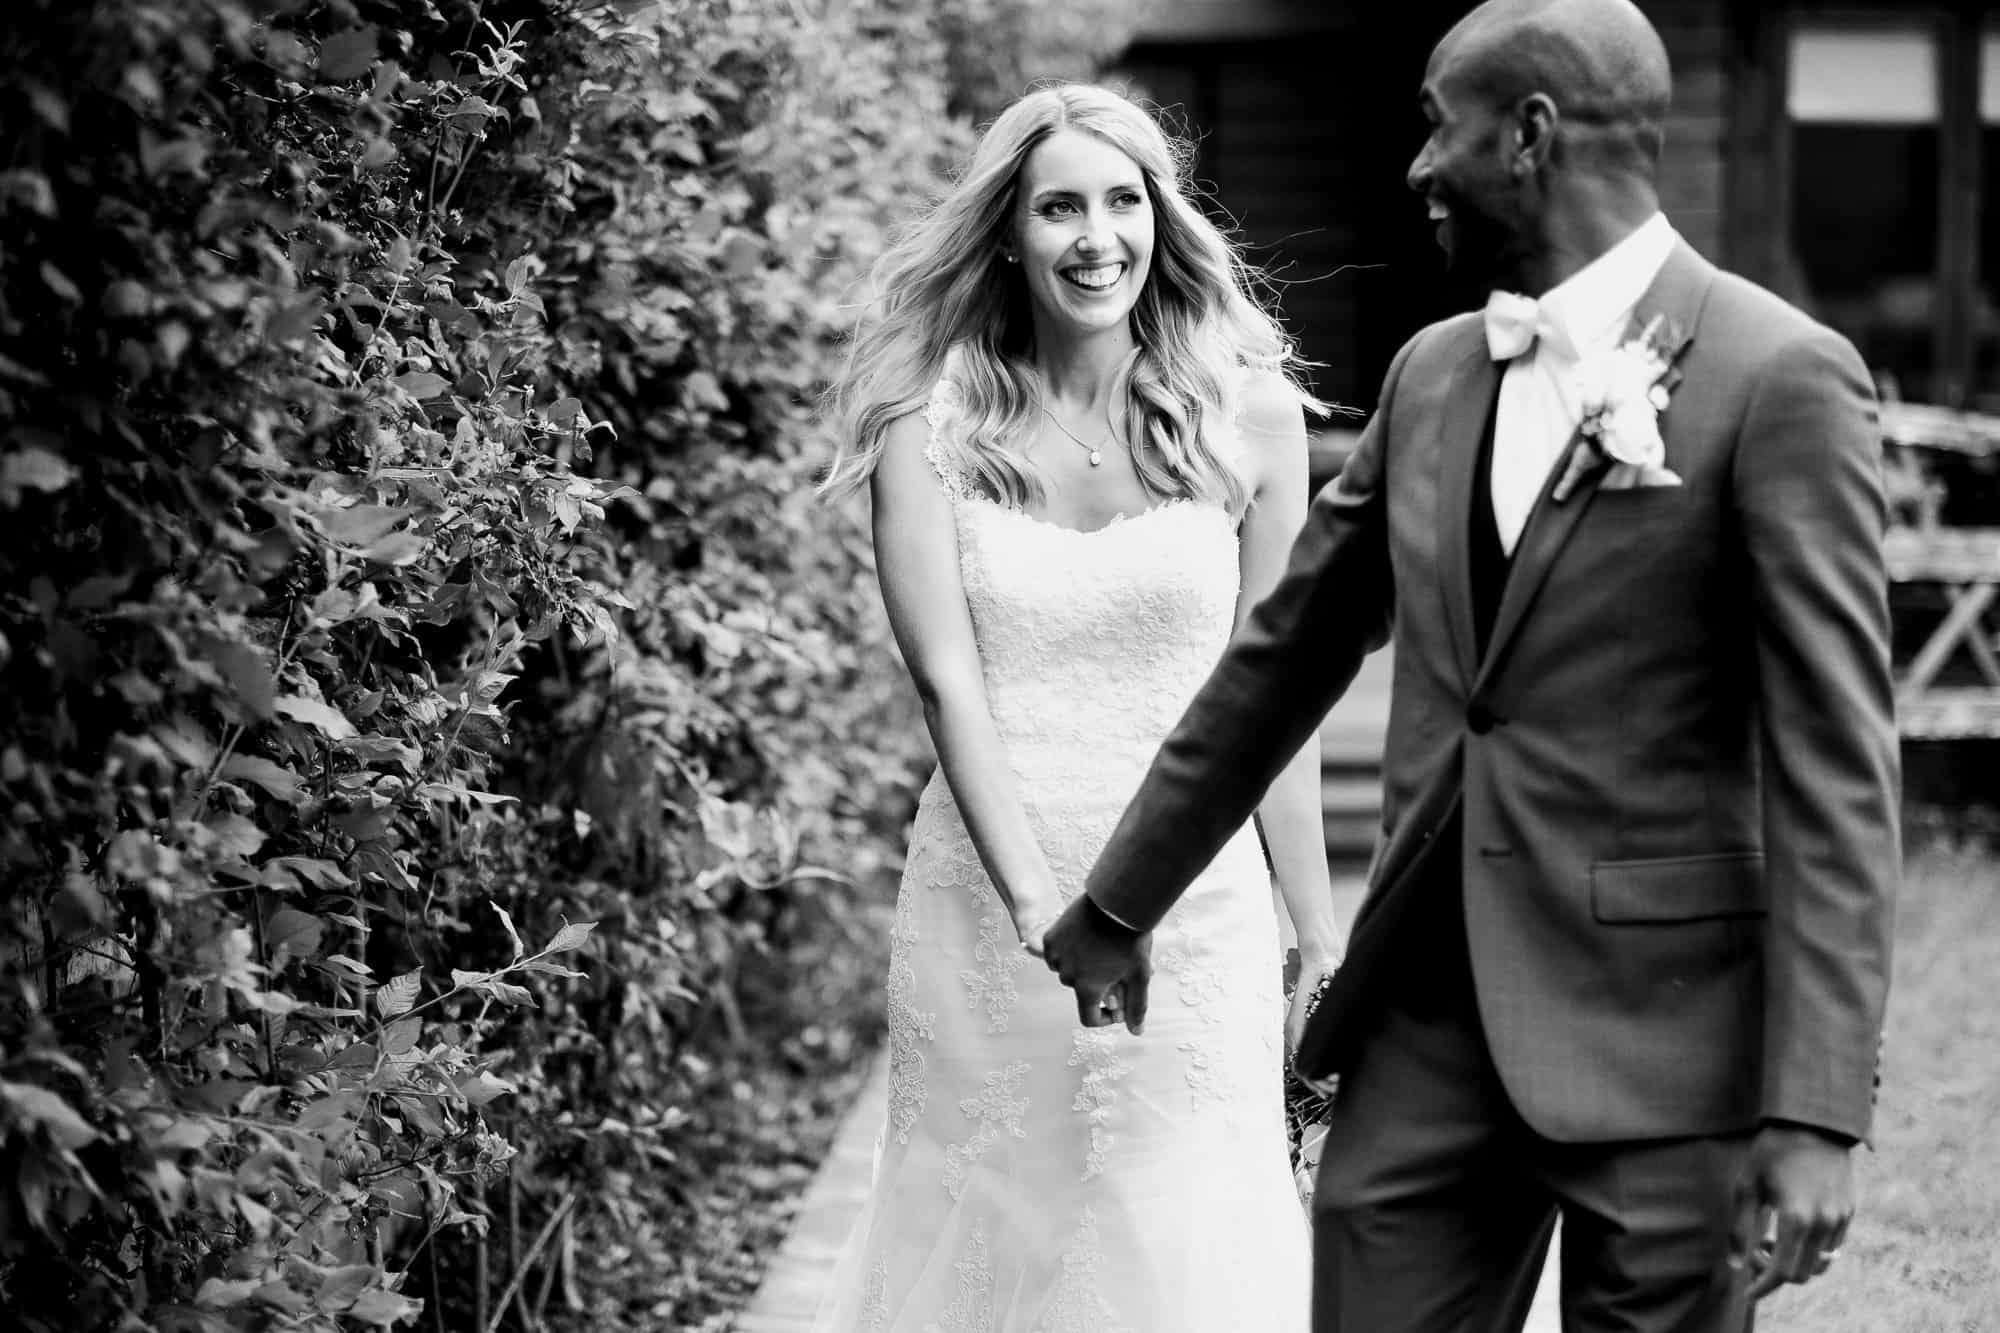 marleybrook-house-wedding-photography-matt-tyler-0043